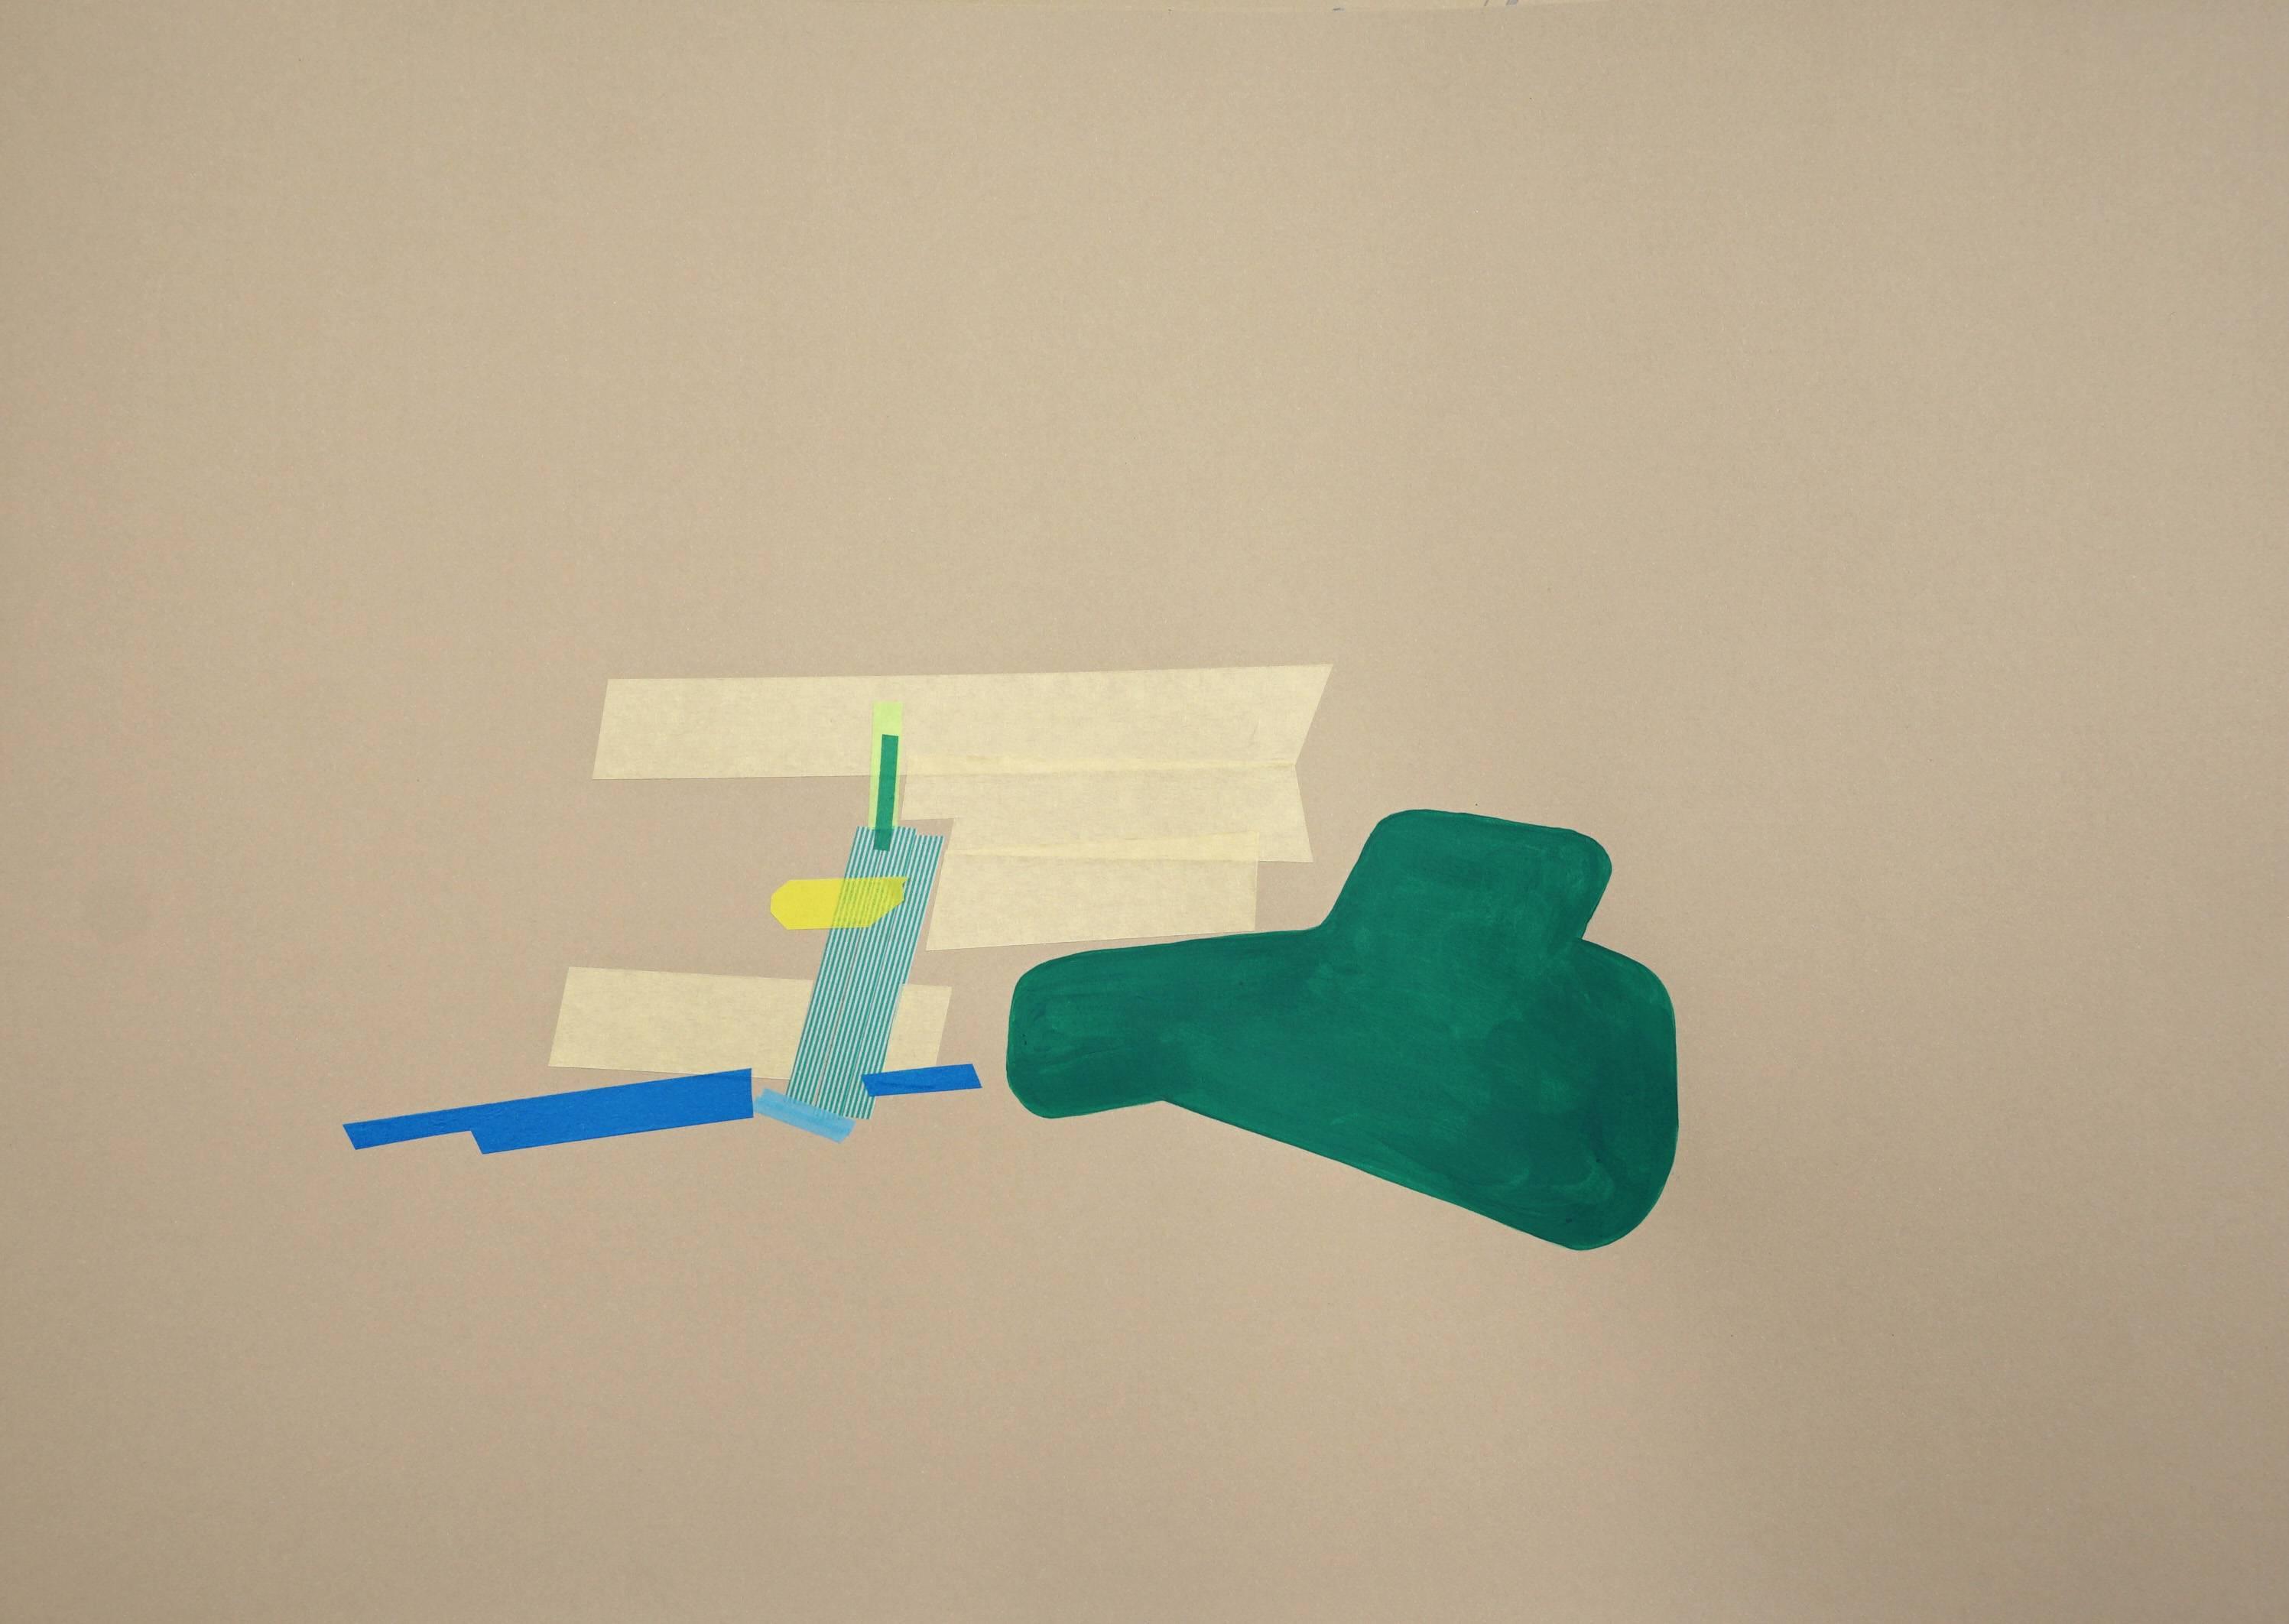 Petra Gell, Serie 'Pêche de vigne 3', Mixed media auf Papier, 50x70, 2018